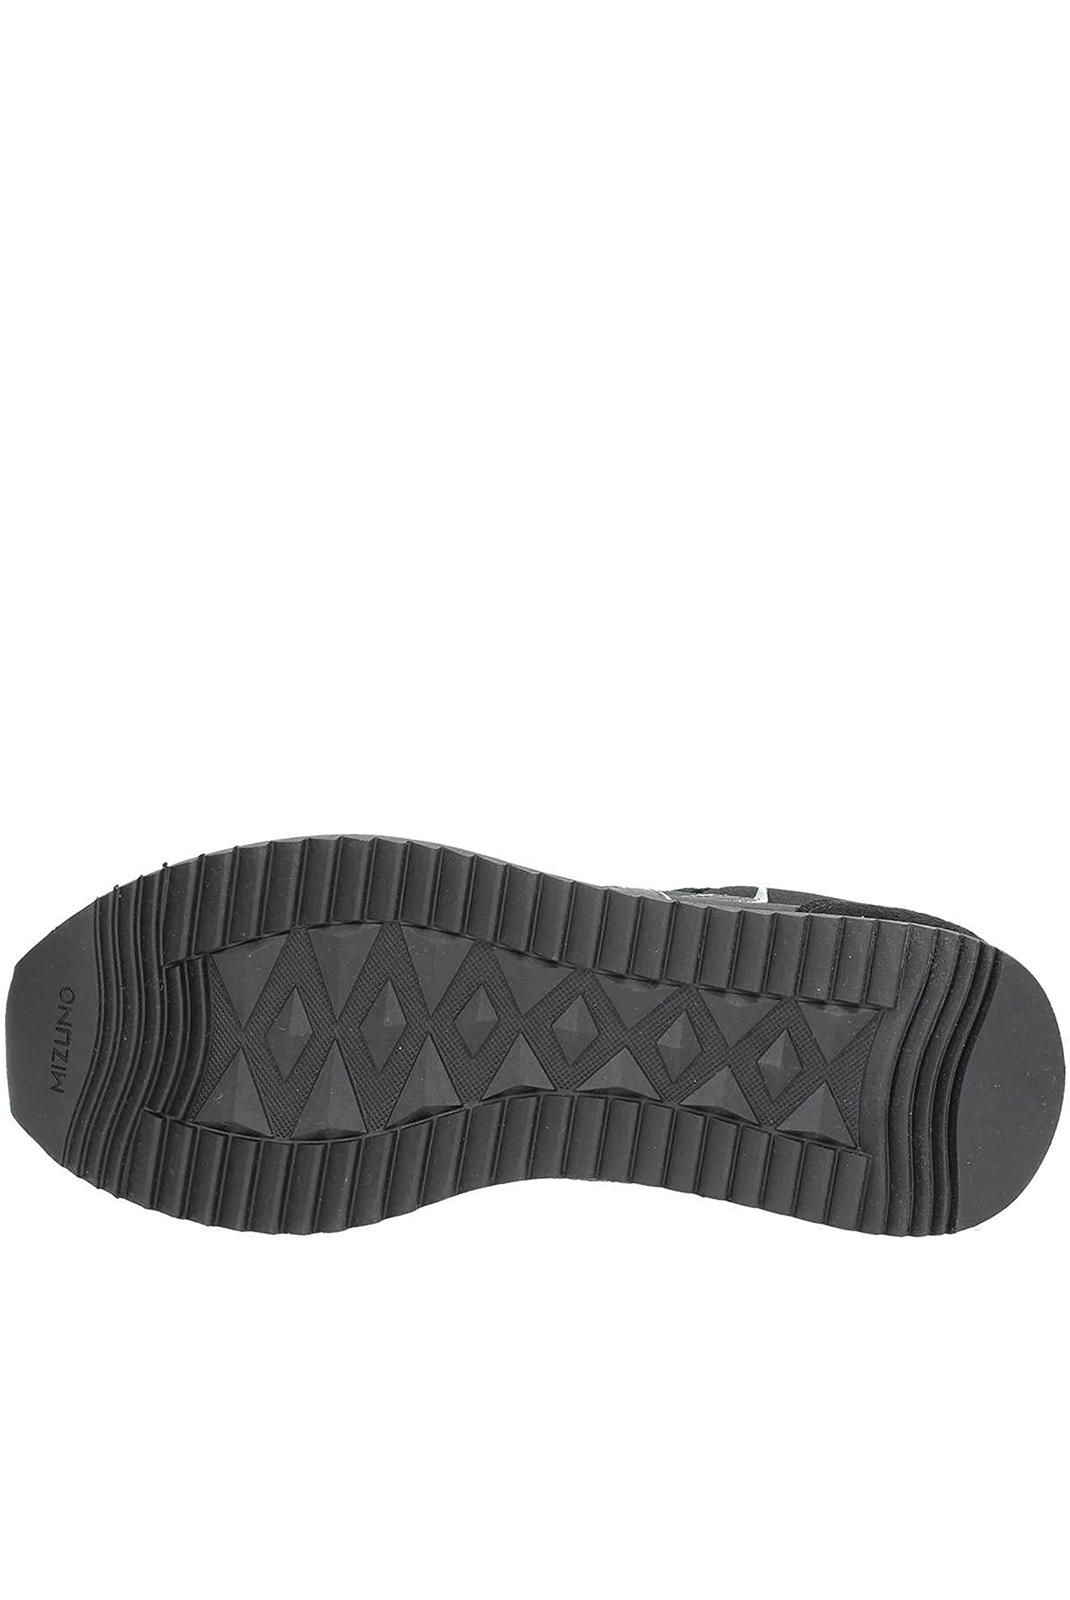 Baskets / Sneakers  Mizuno D1GE181309 ETAMIN 2  BLACK/SILVE